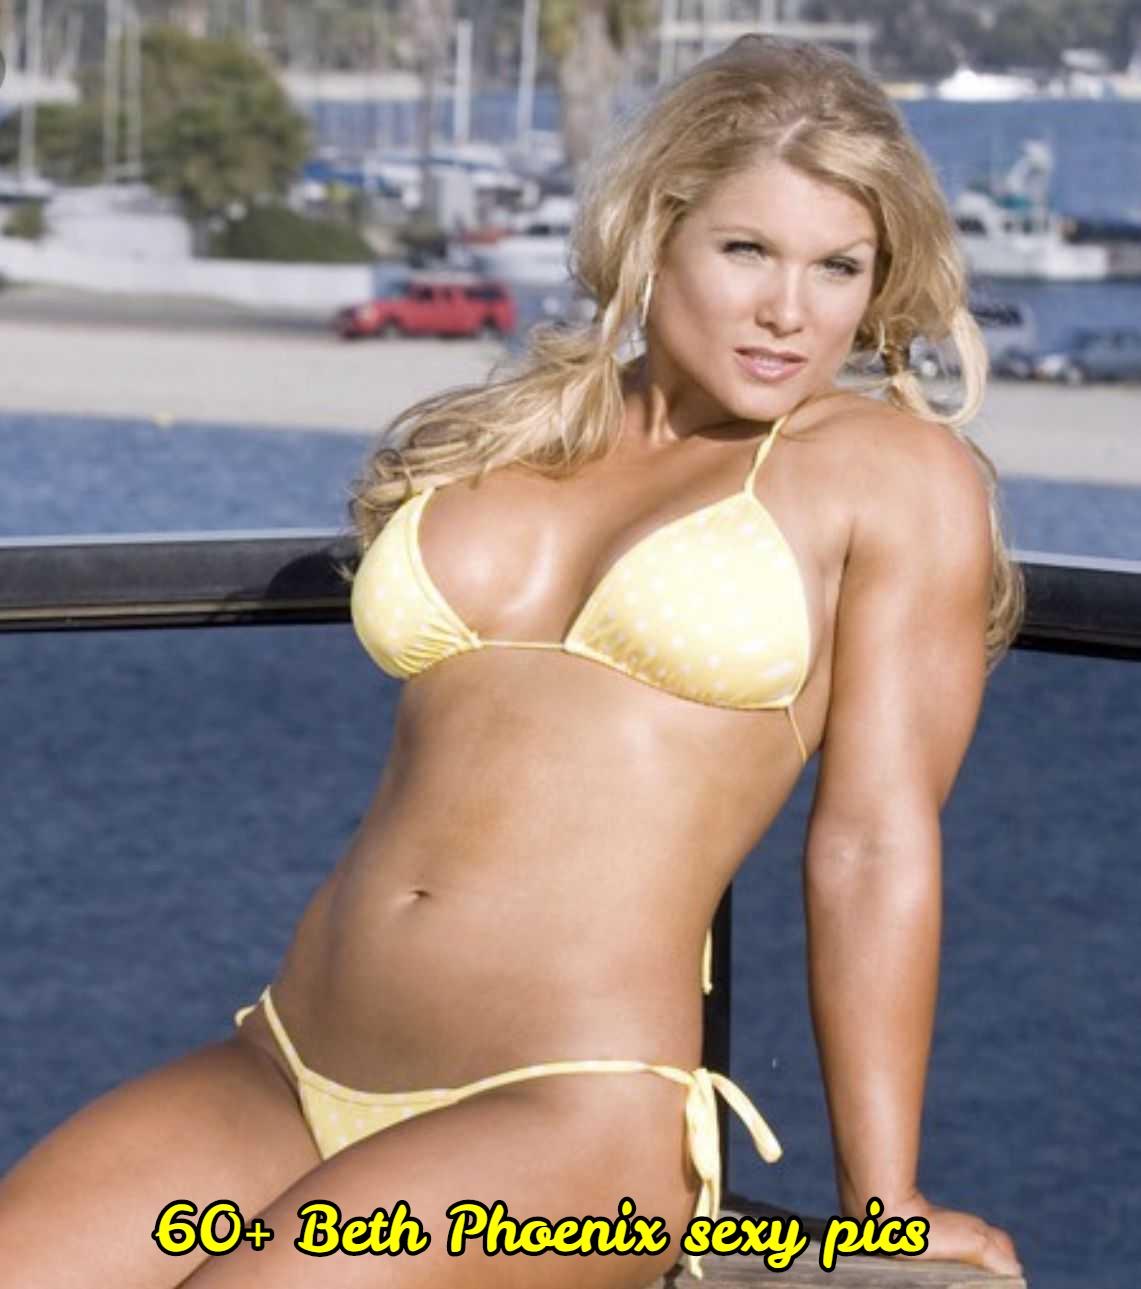 Beth Phoenix sexy bikini pic